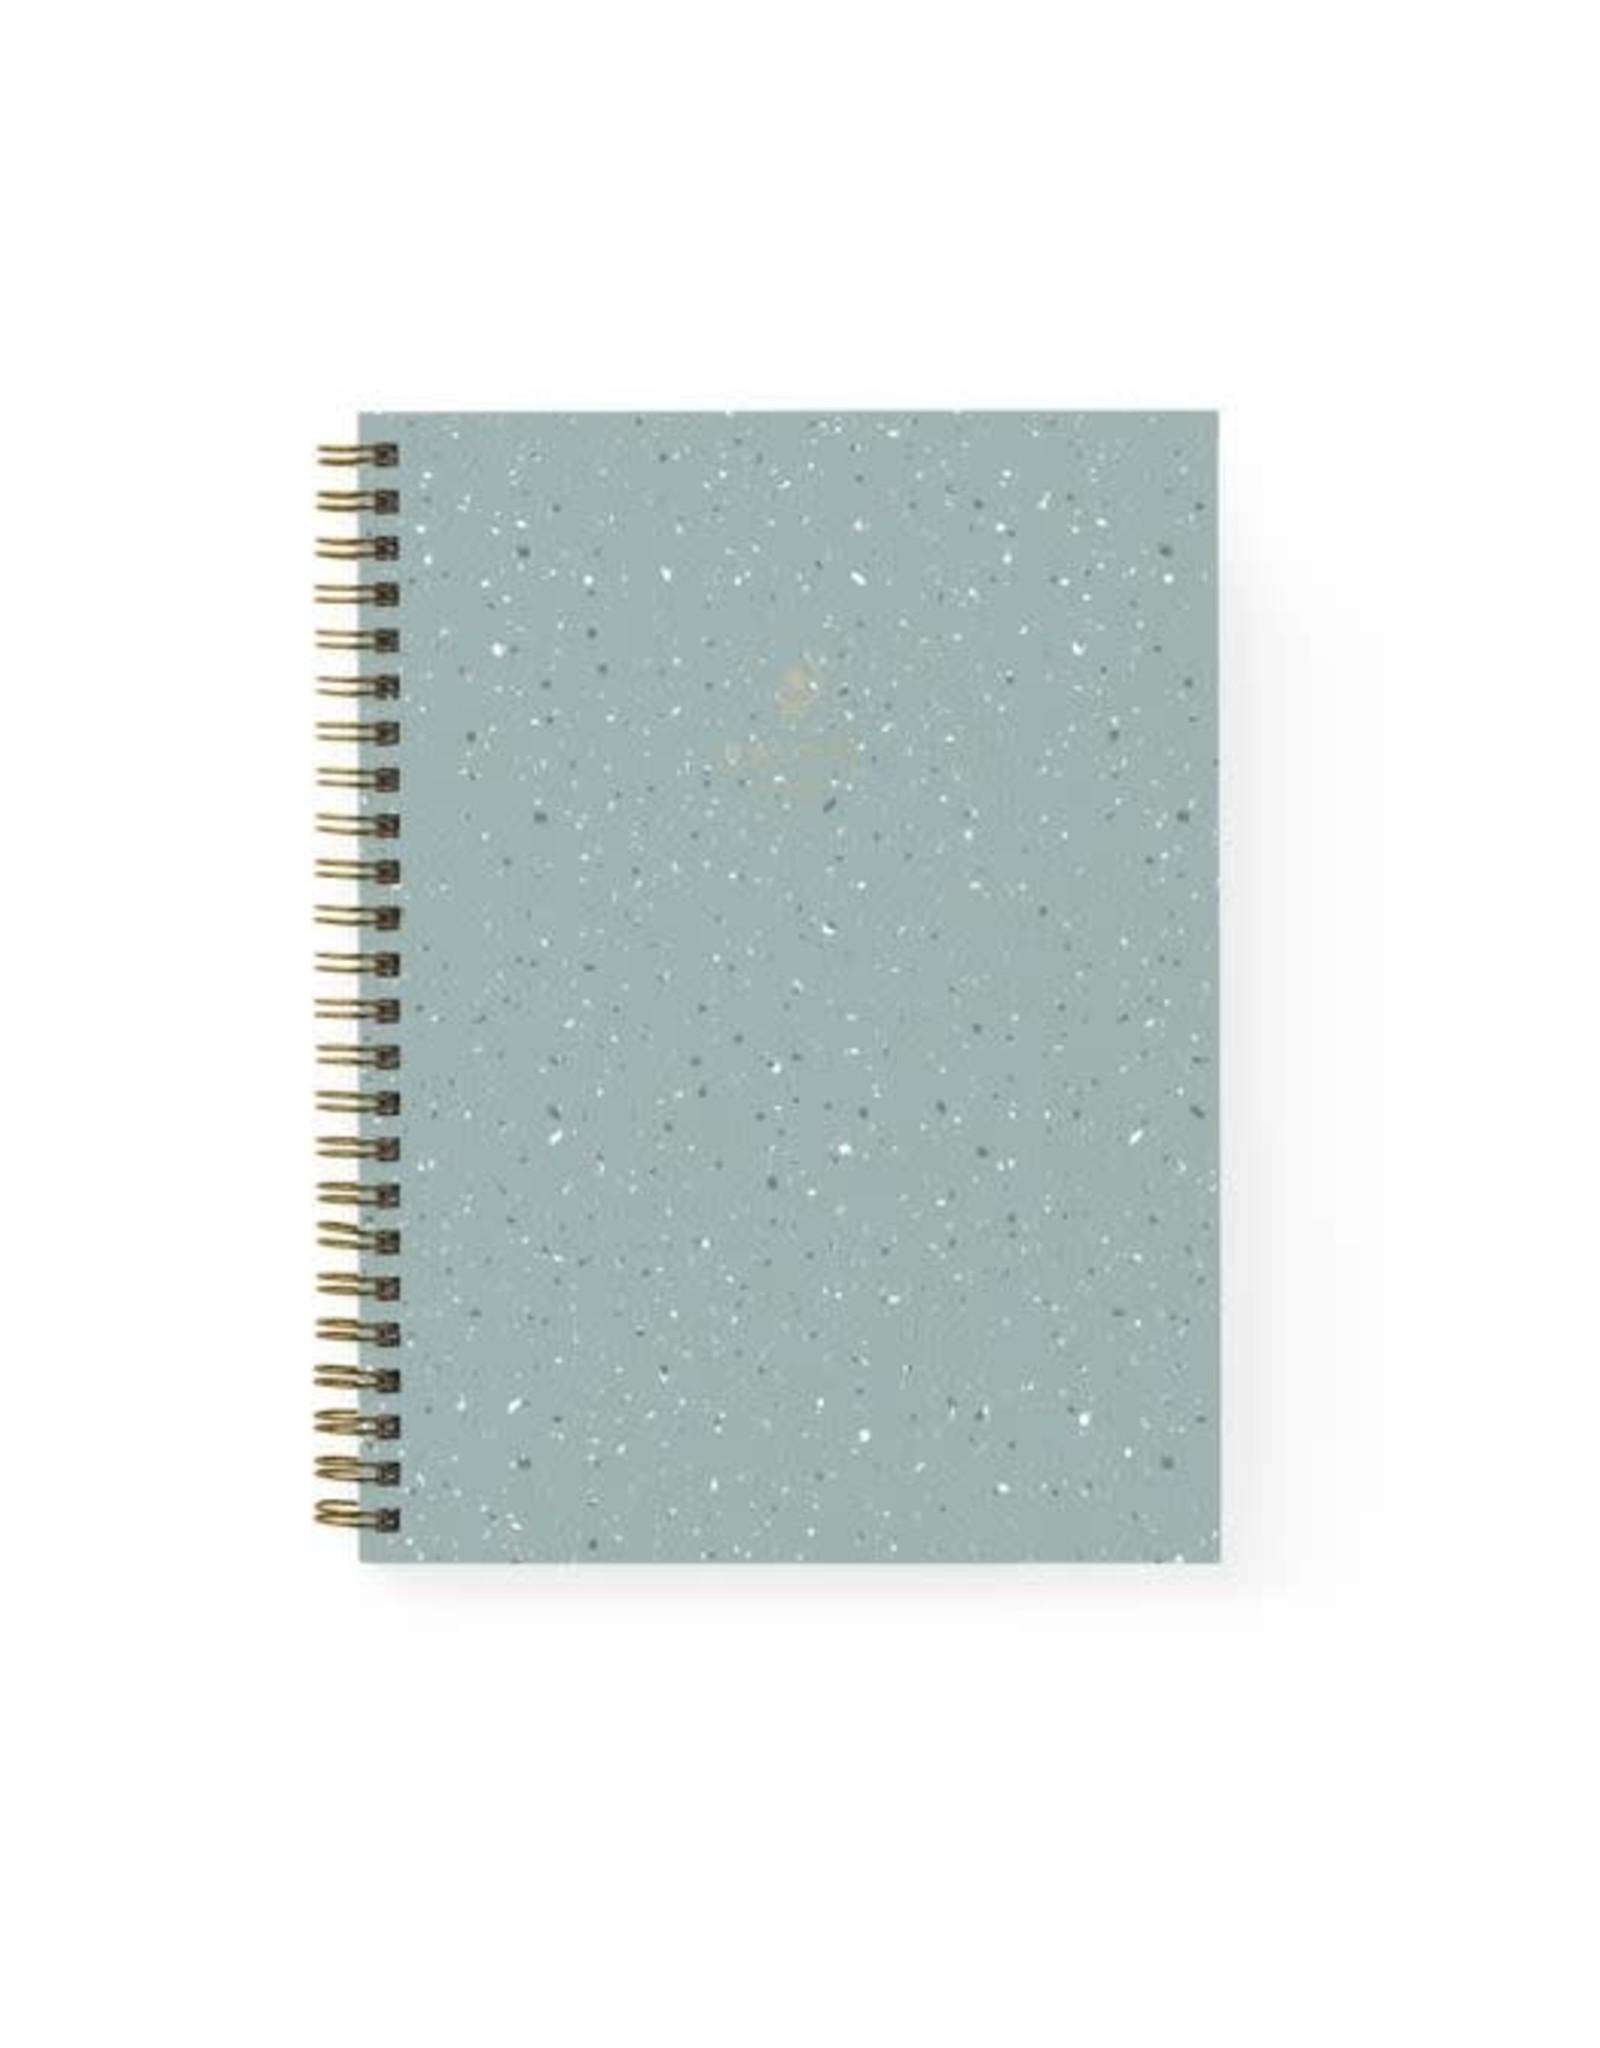 Baltic Club Spiral Notebook - Mint Terrazzo